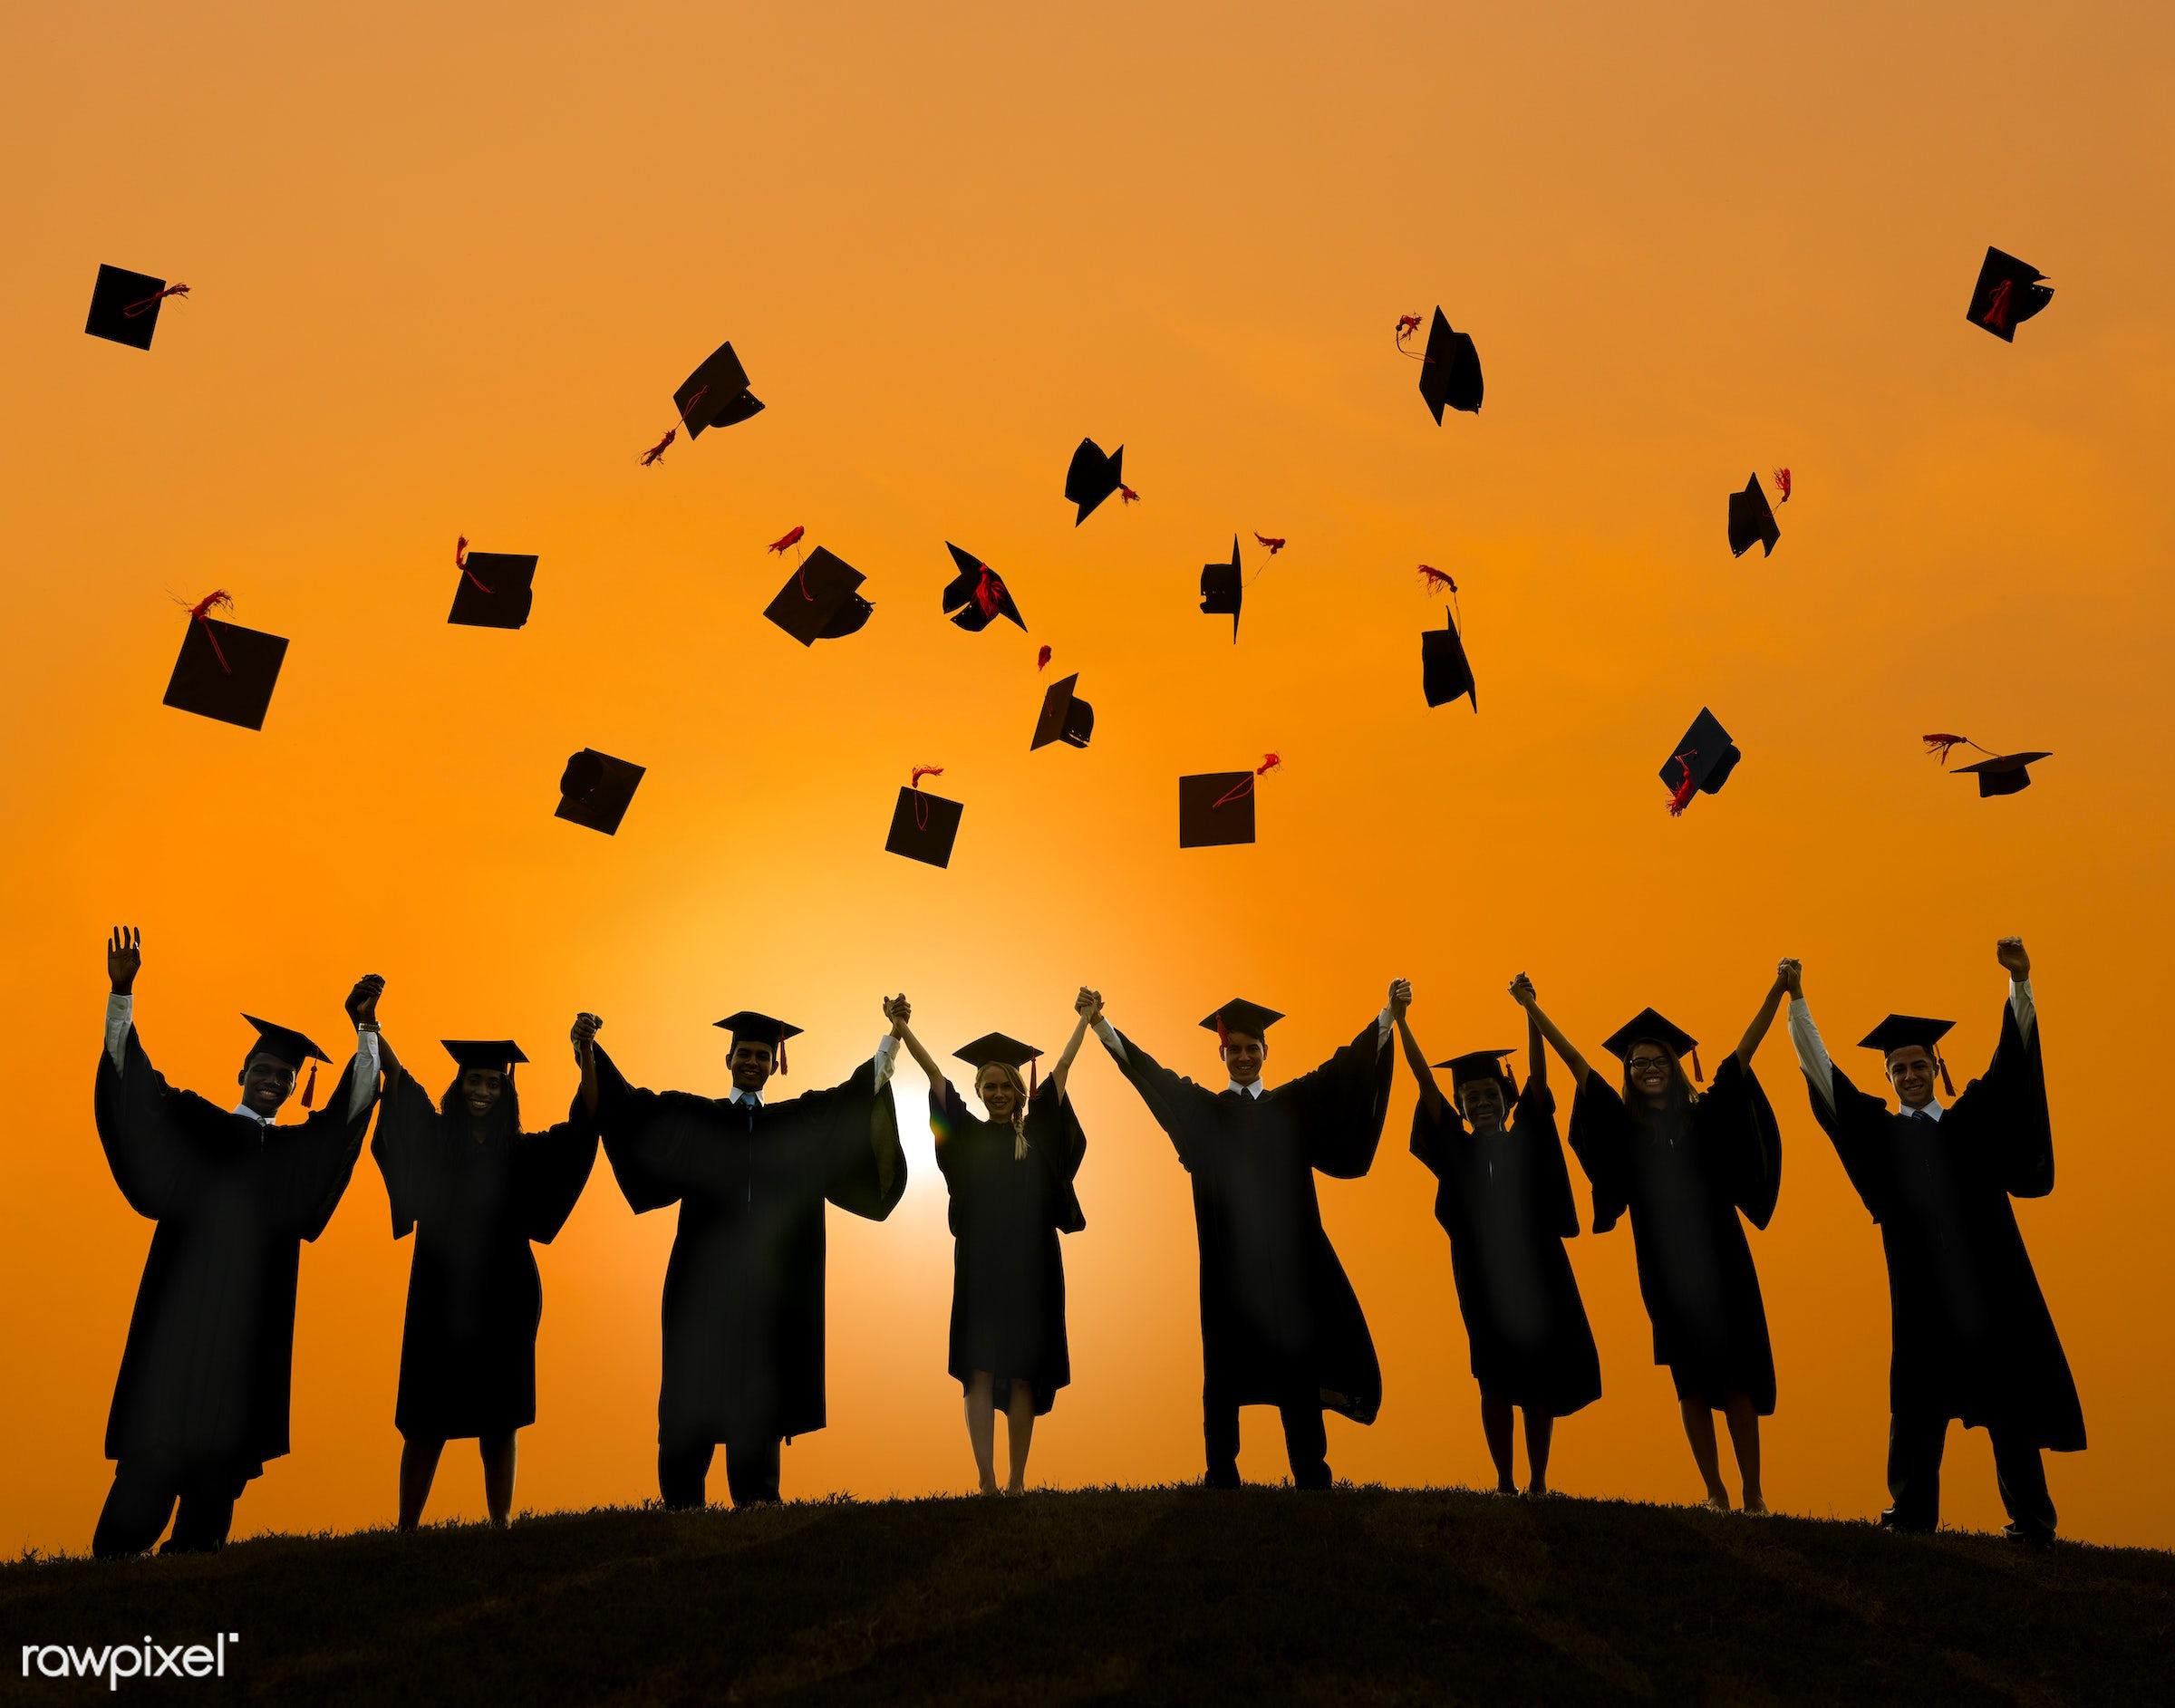 graduate, academic, achievement, campus, cap, celebration, ceremony, certificate, cheerful, college, college student,...